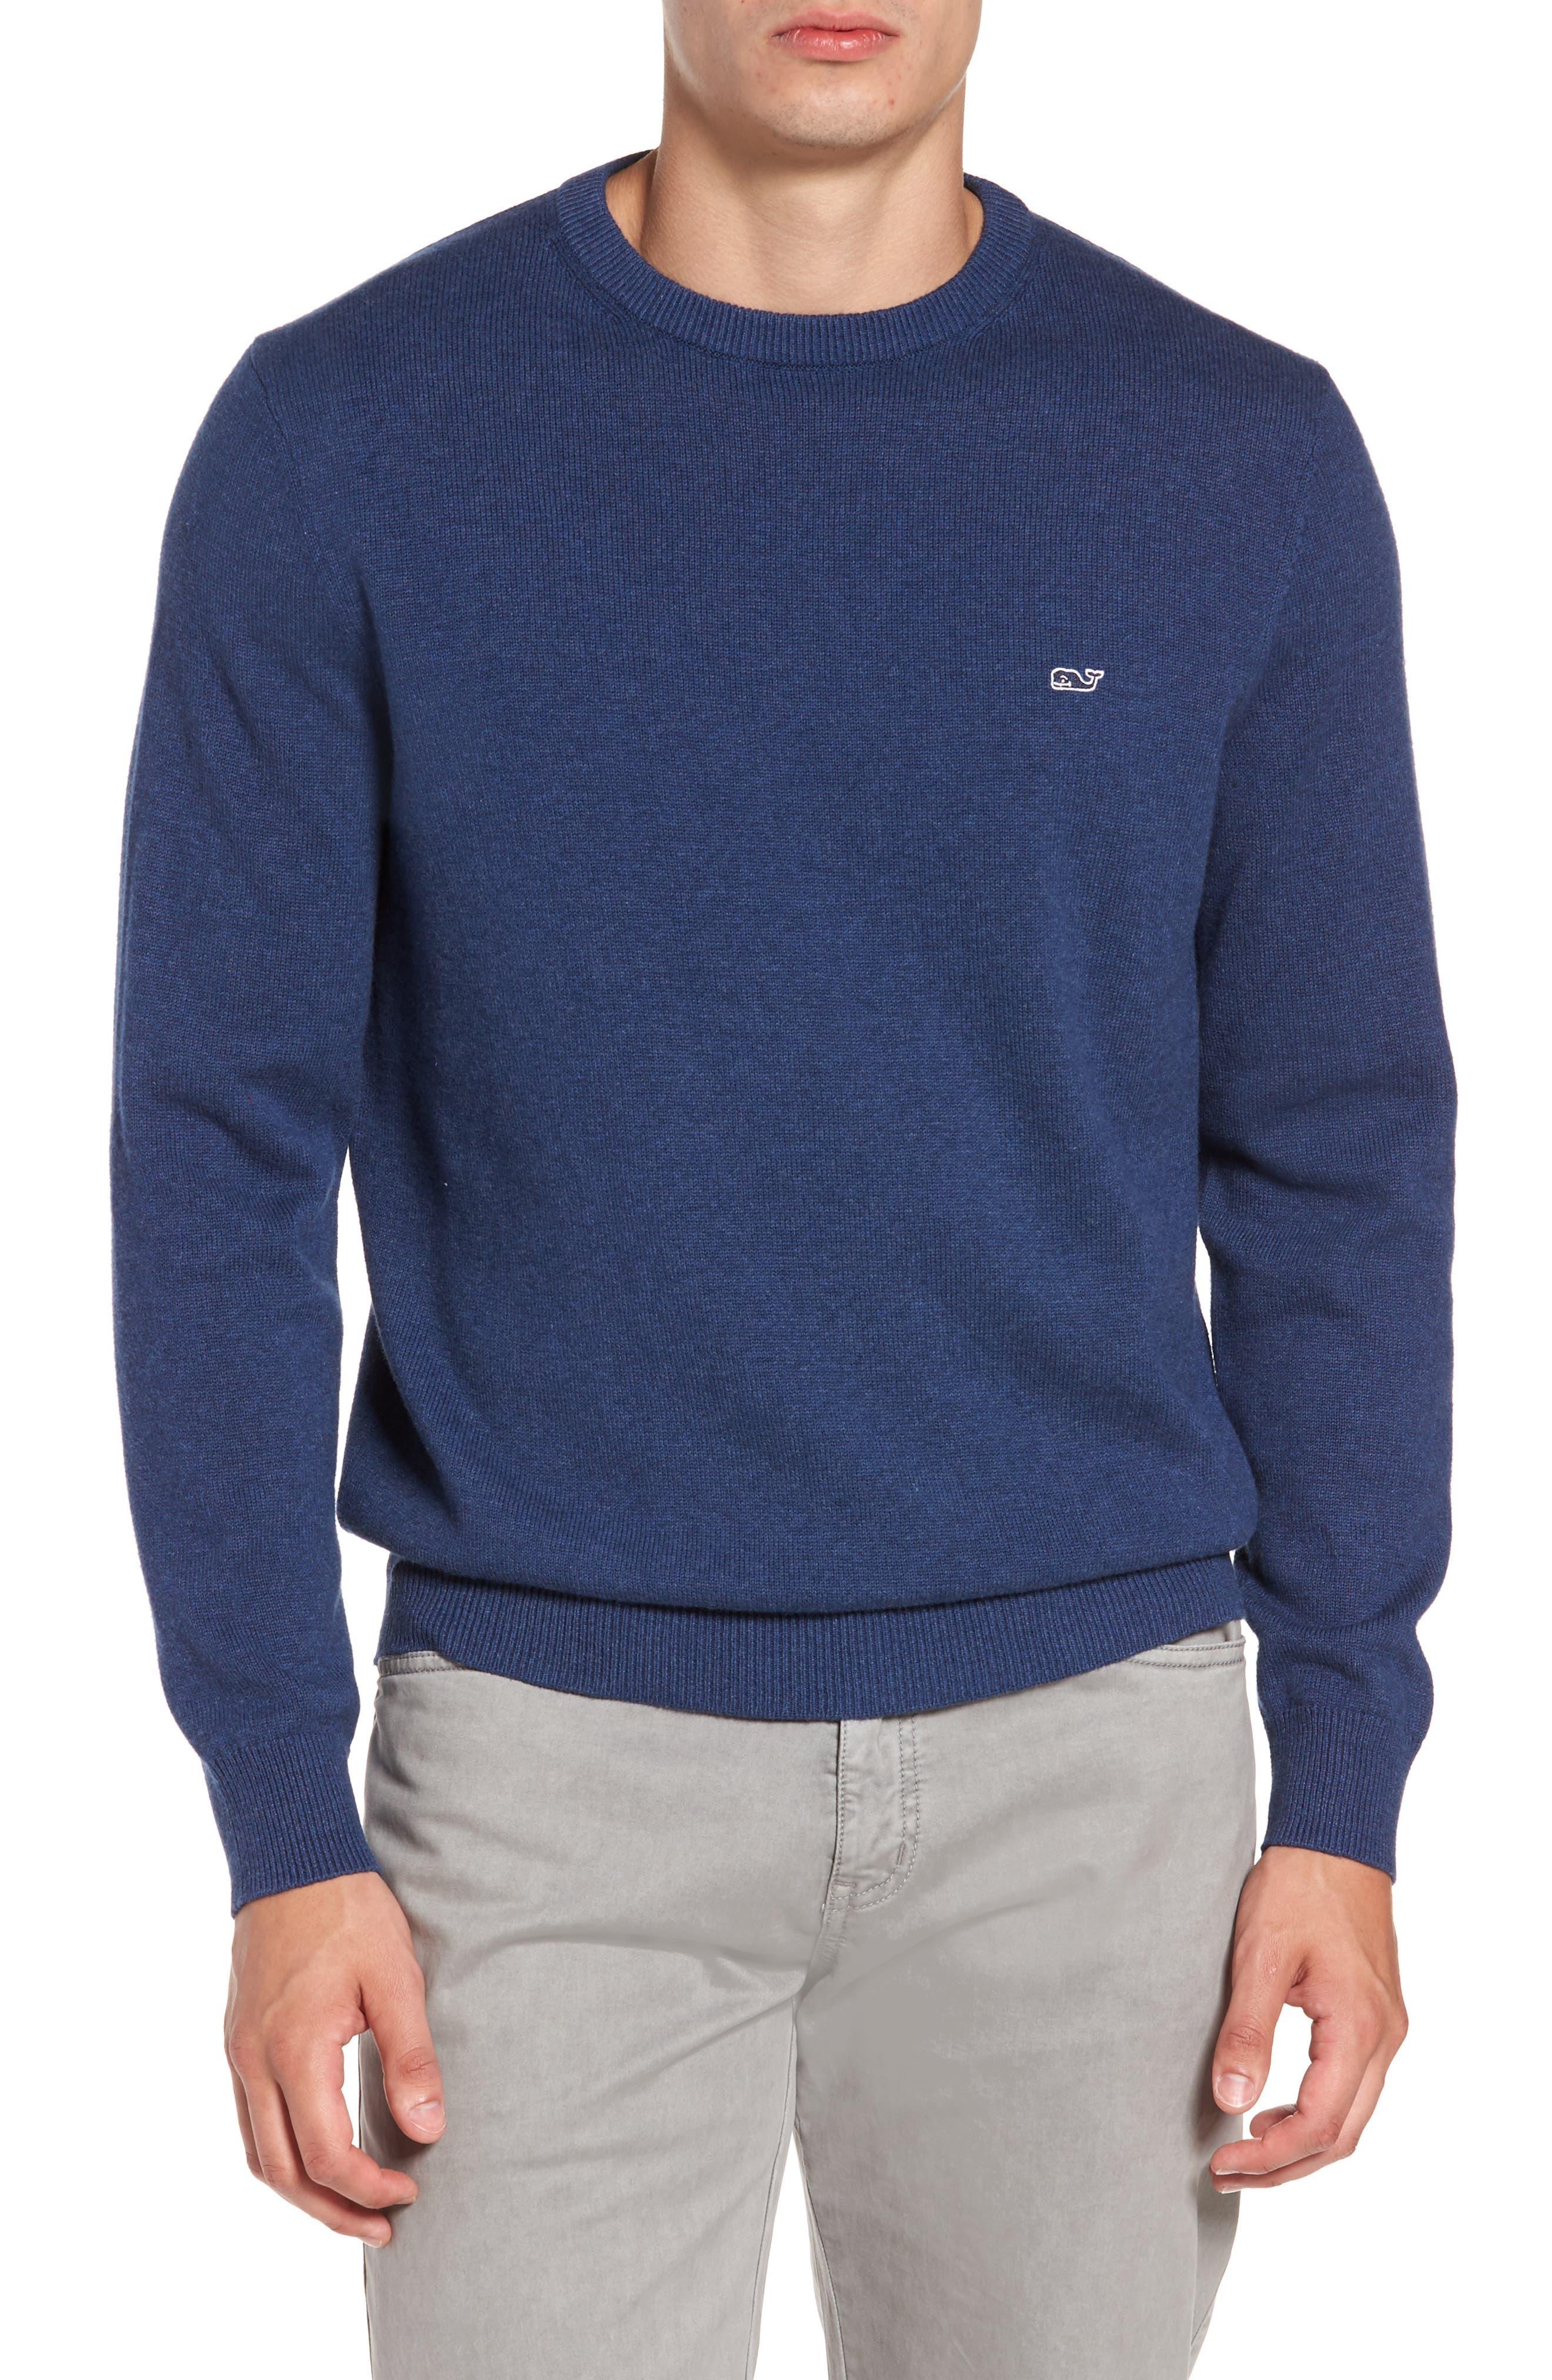 Vineyard Vines Lightweight Crewneck Sweater